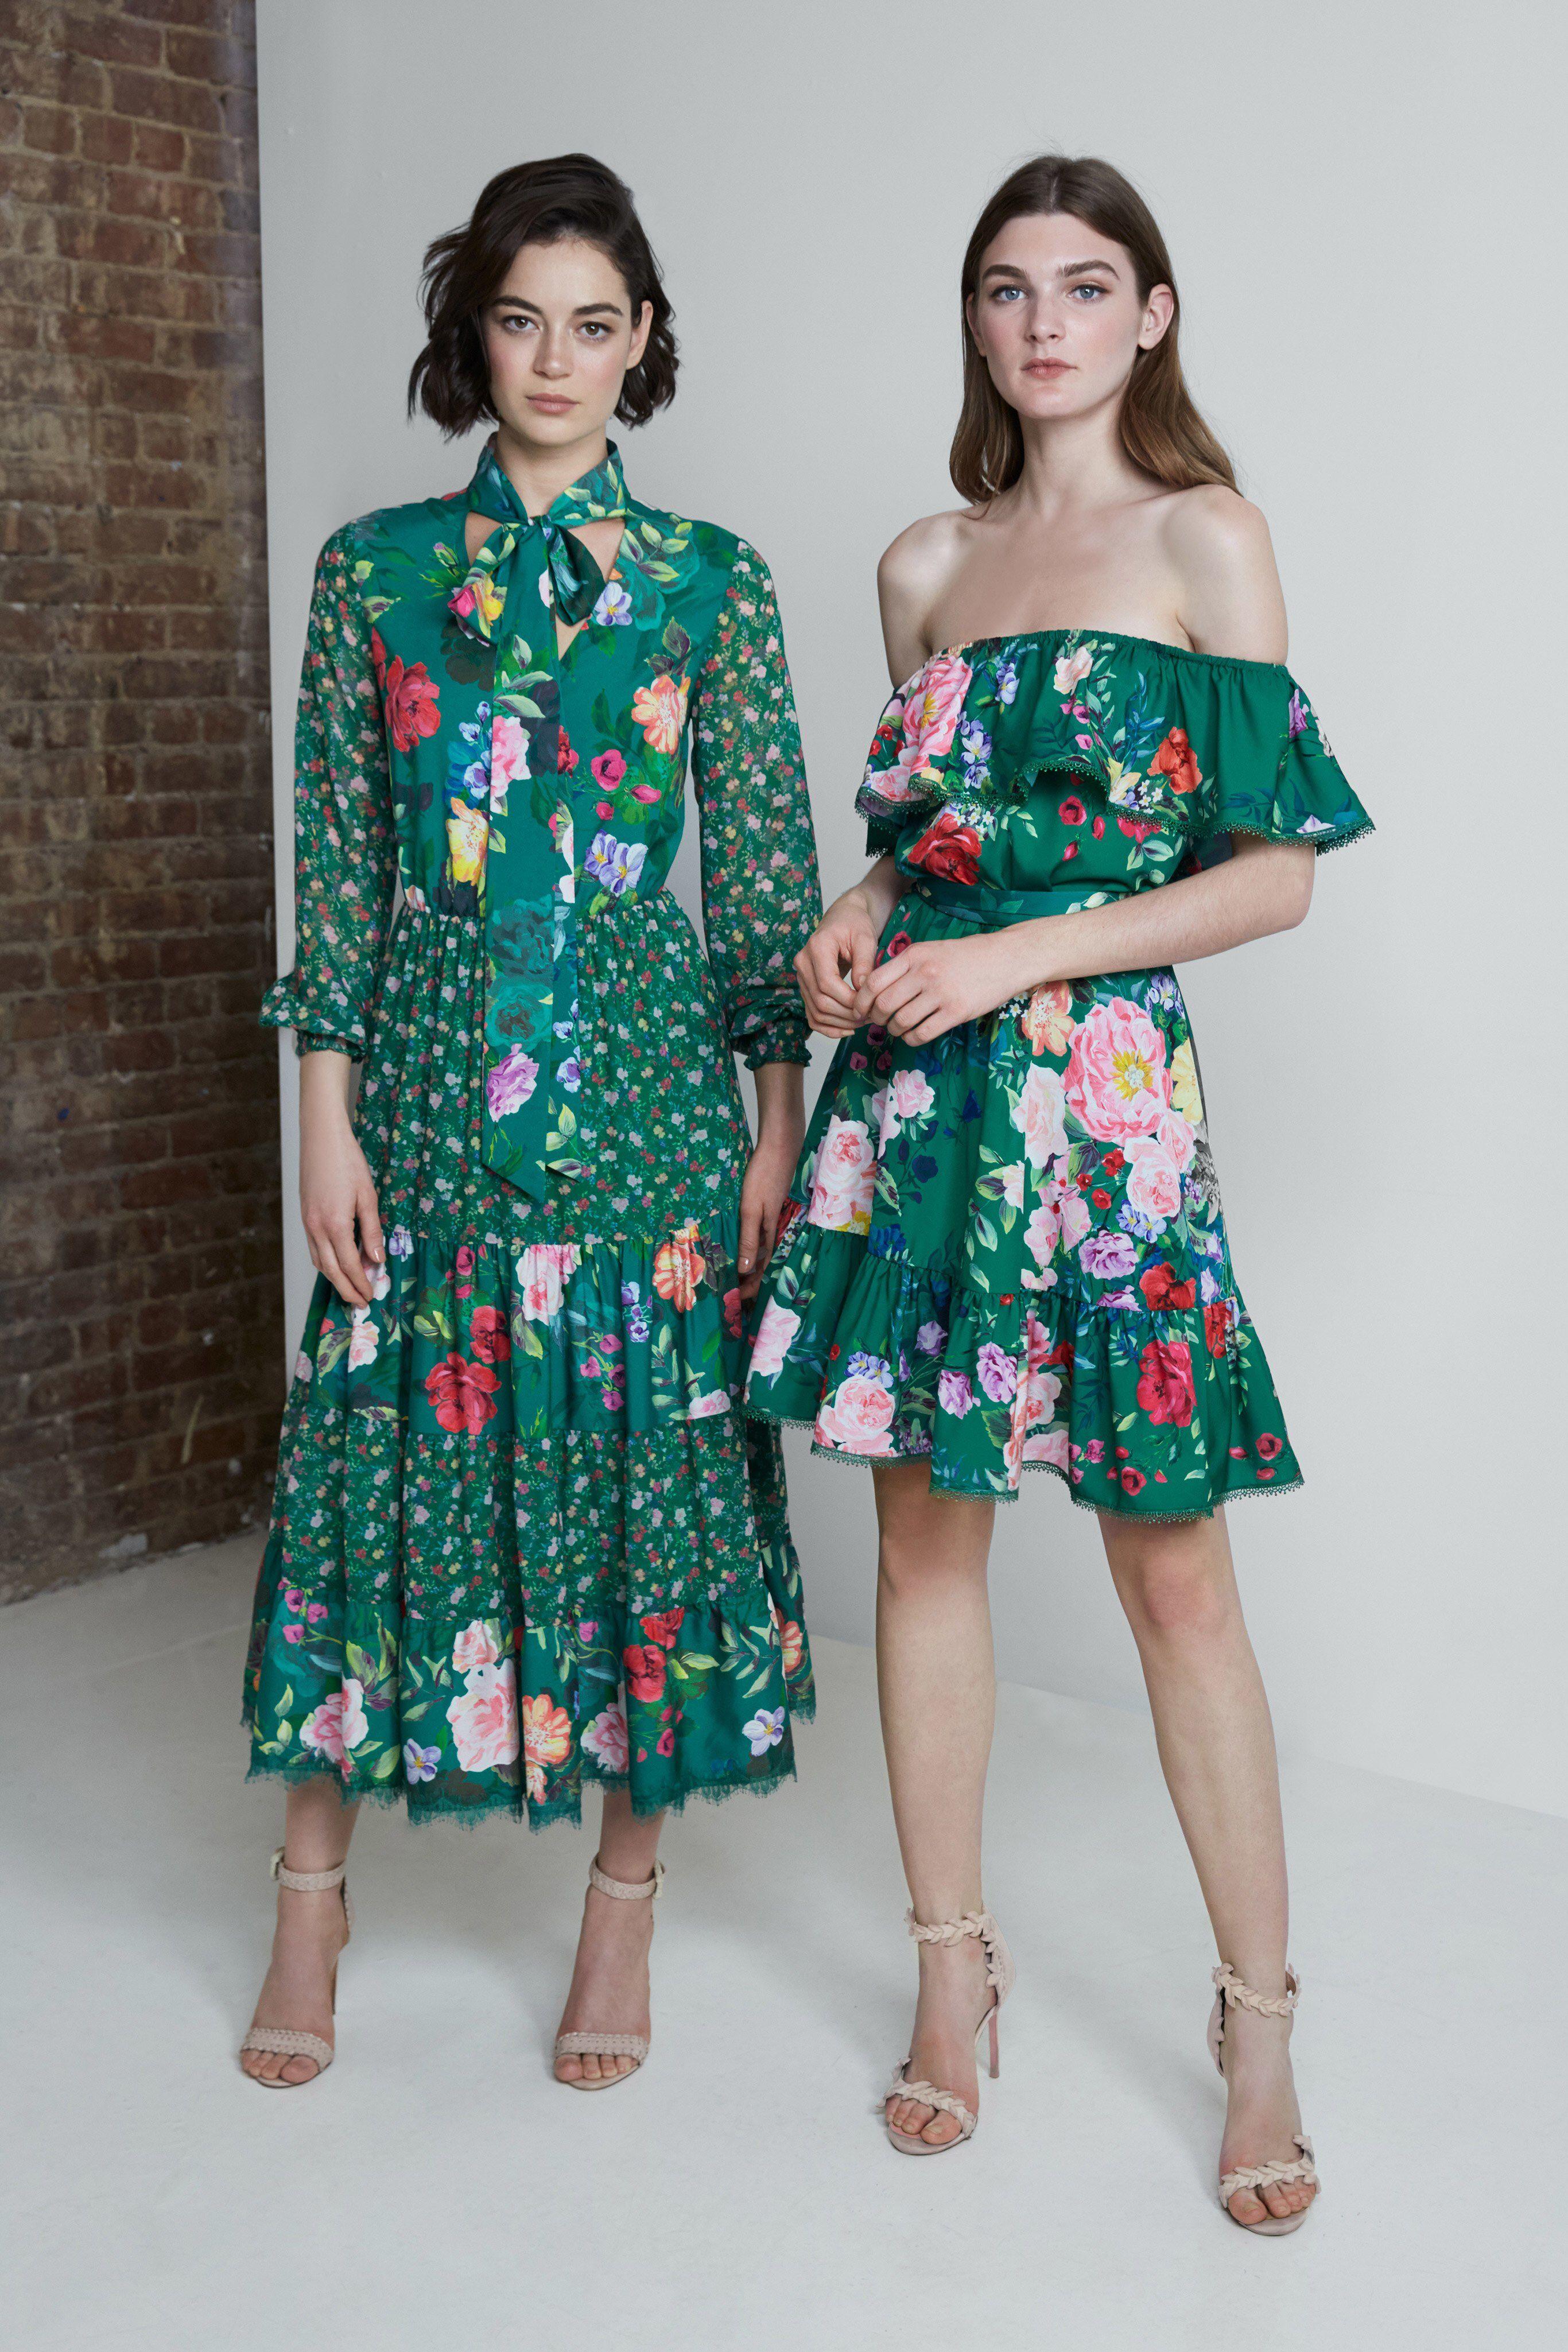 Marchesa Notte Pre Fall 2020 Fashion Show In 2020 Fashion Christmas Fashion Fashion Show